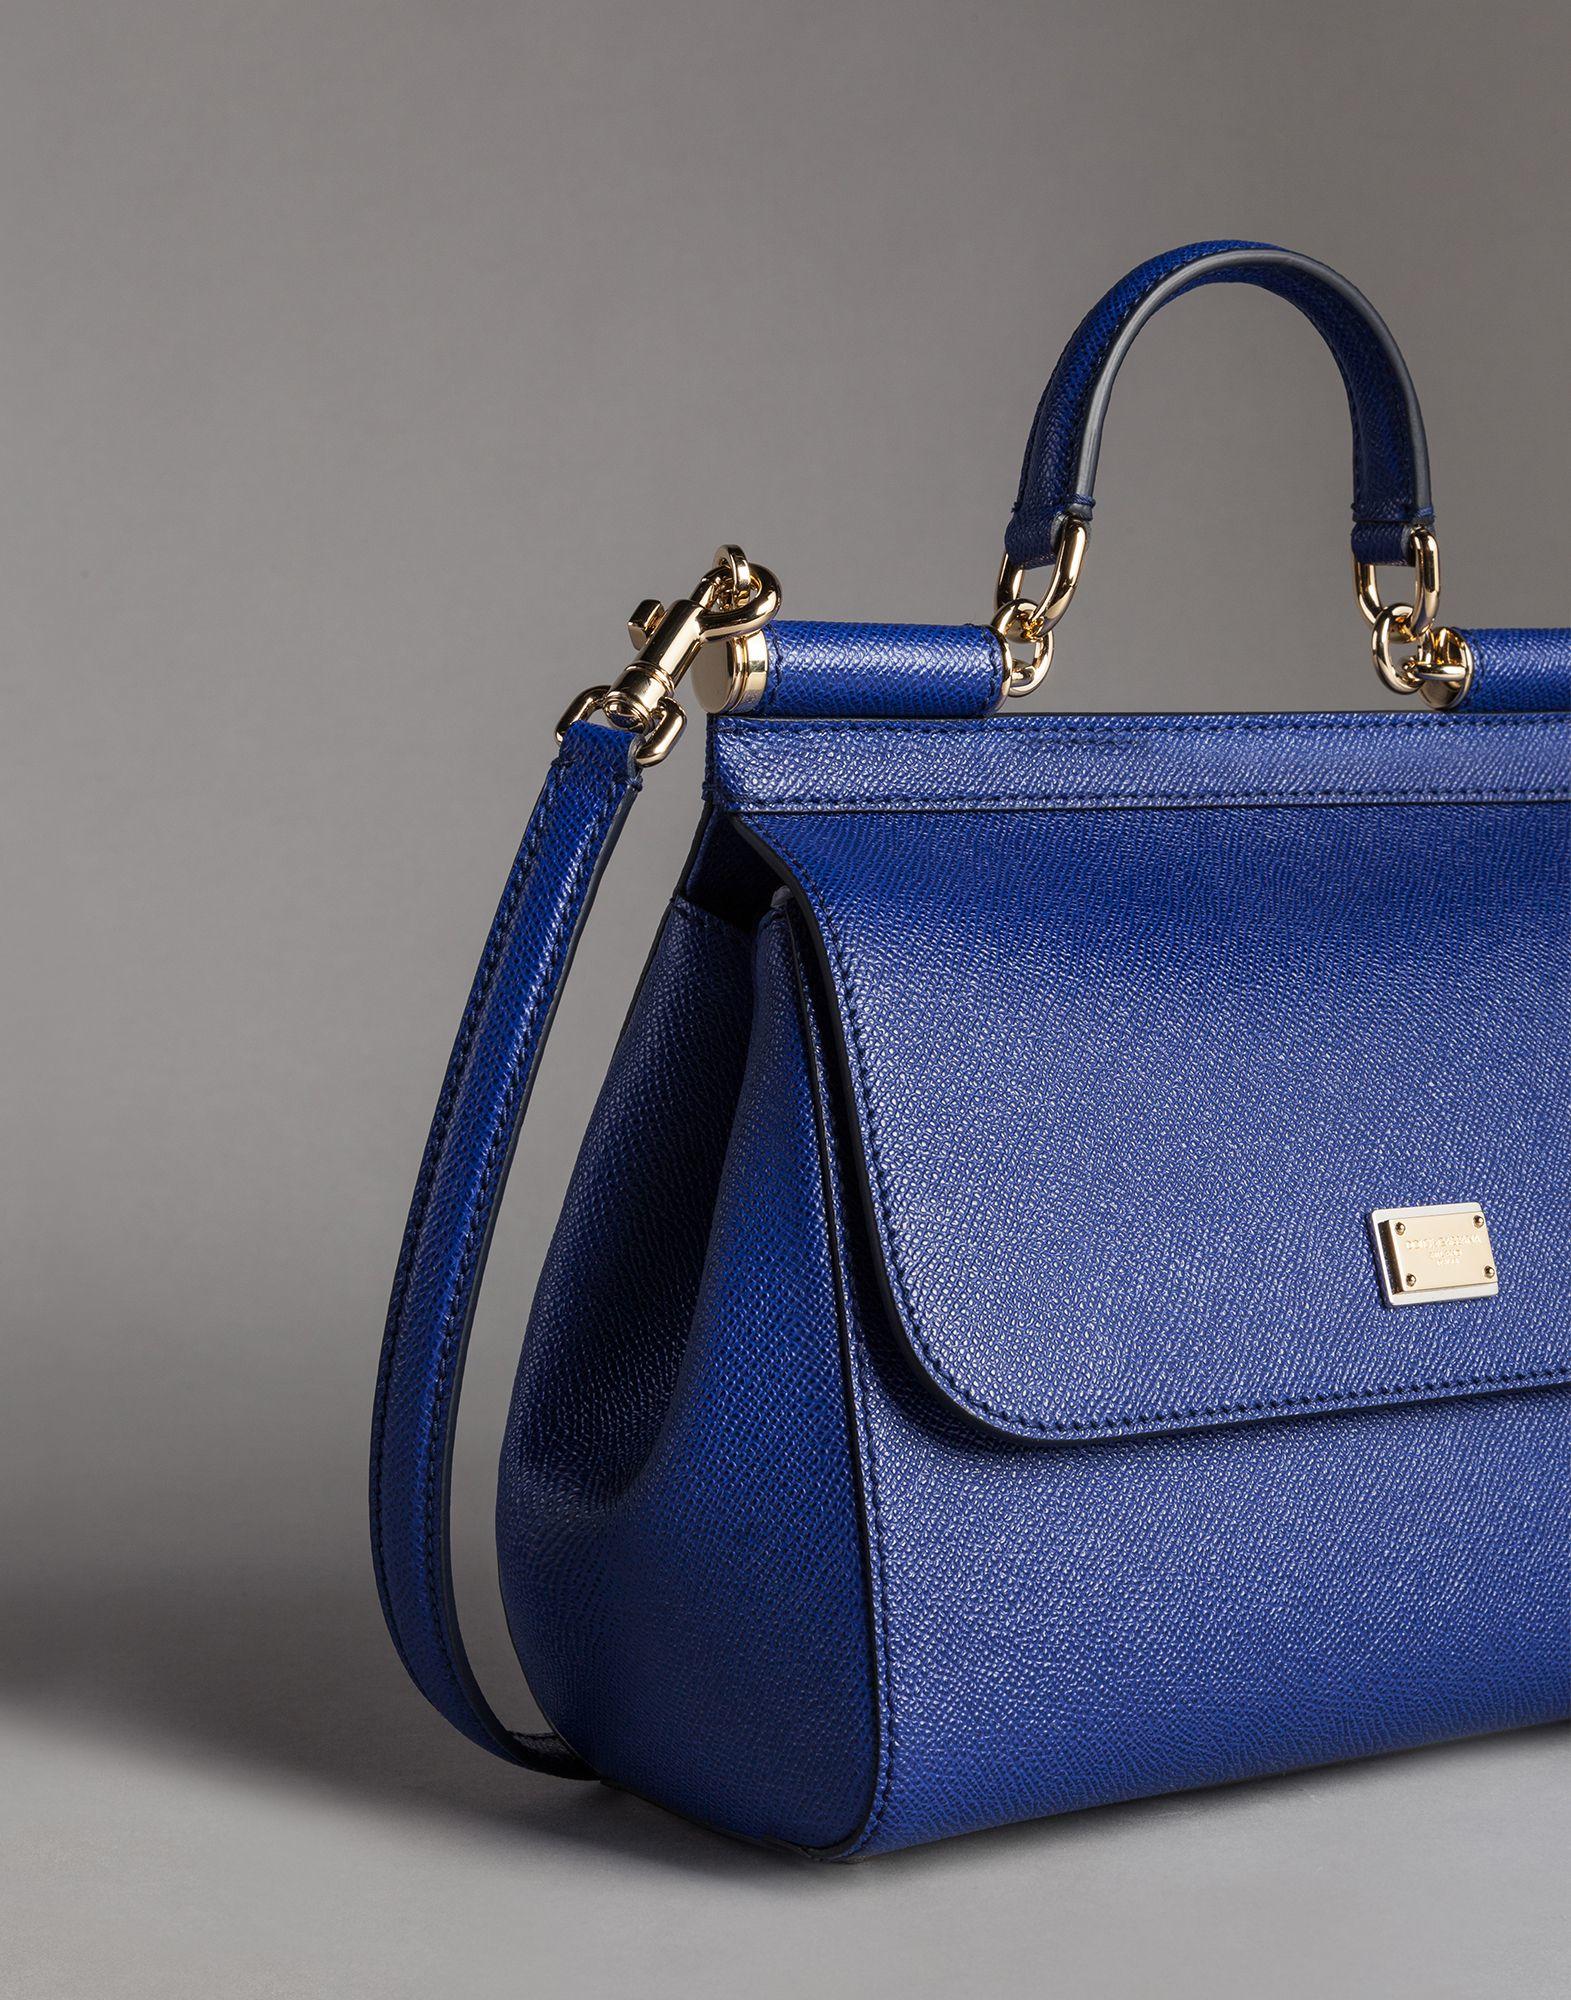 fcfb6384afc Lyst - Dolce   Gabbana Medium Dauphine Calfskin Sicily Bag in Blue